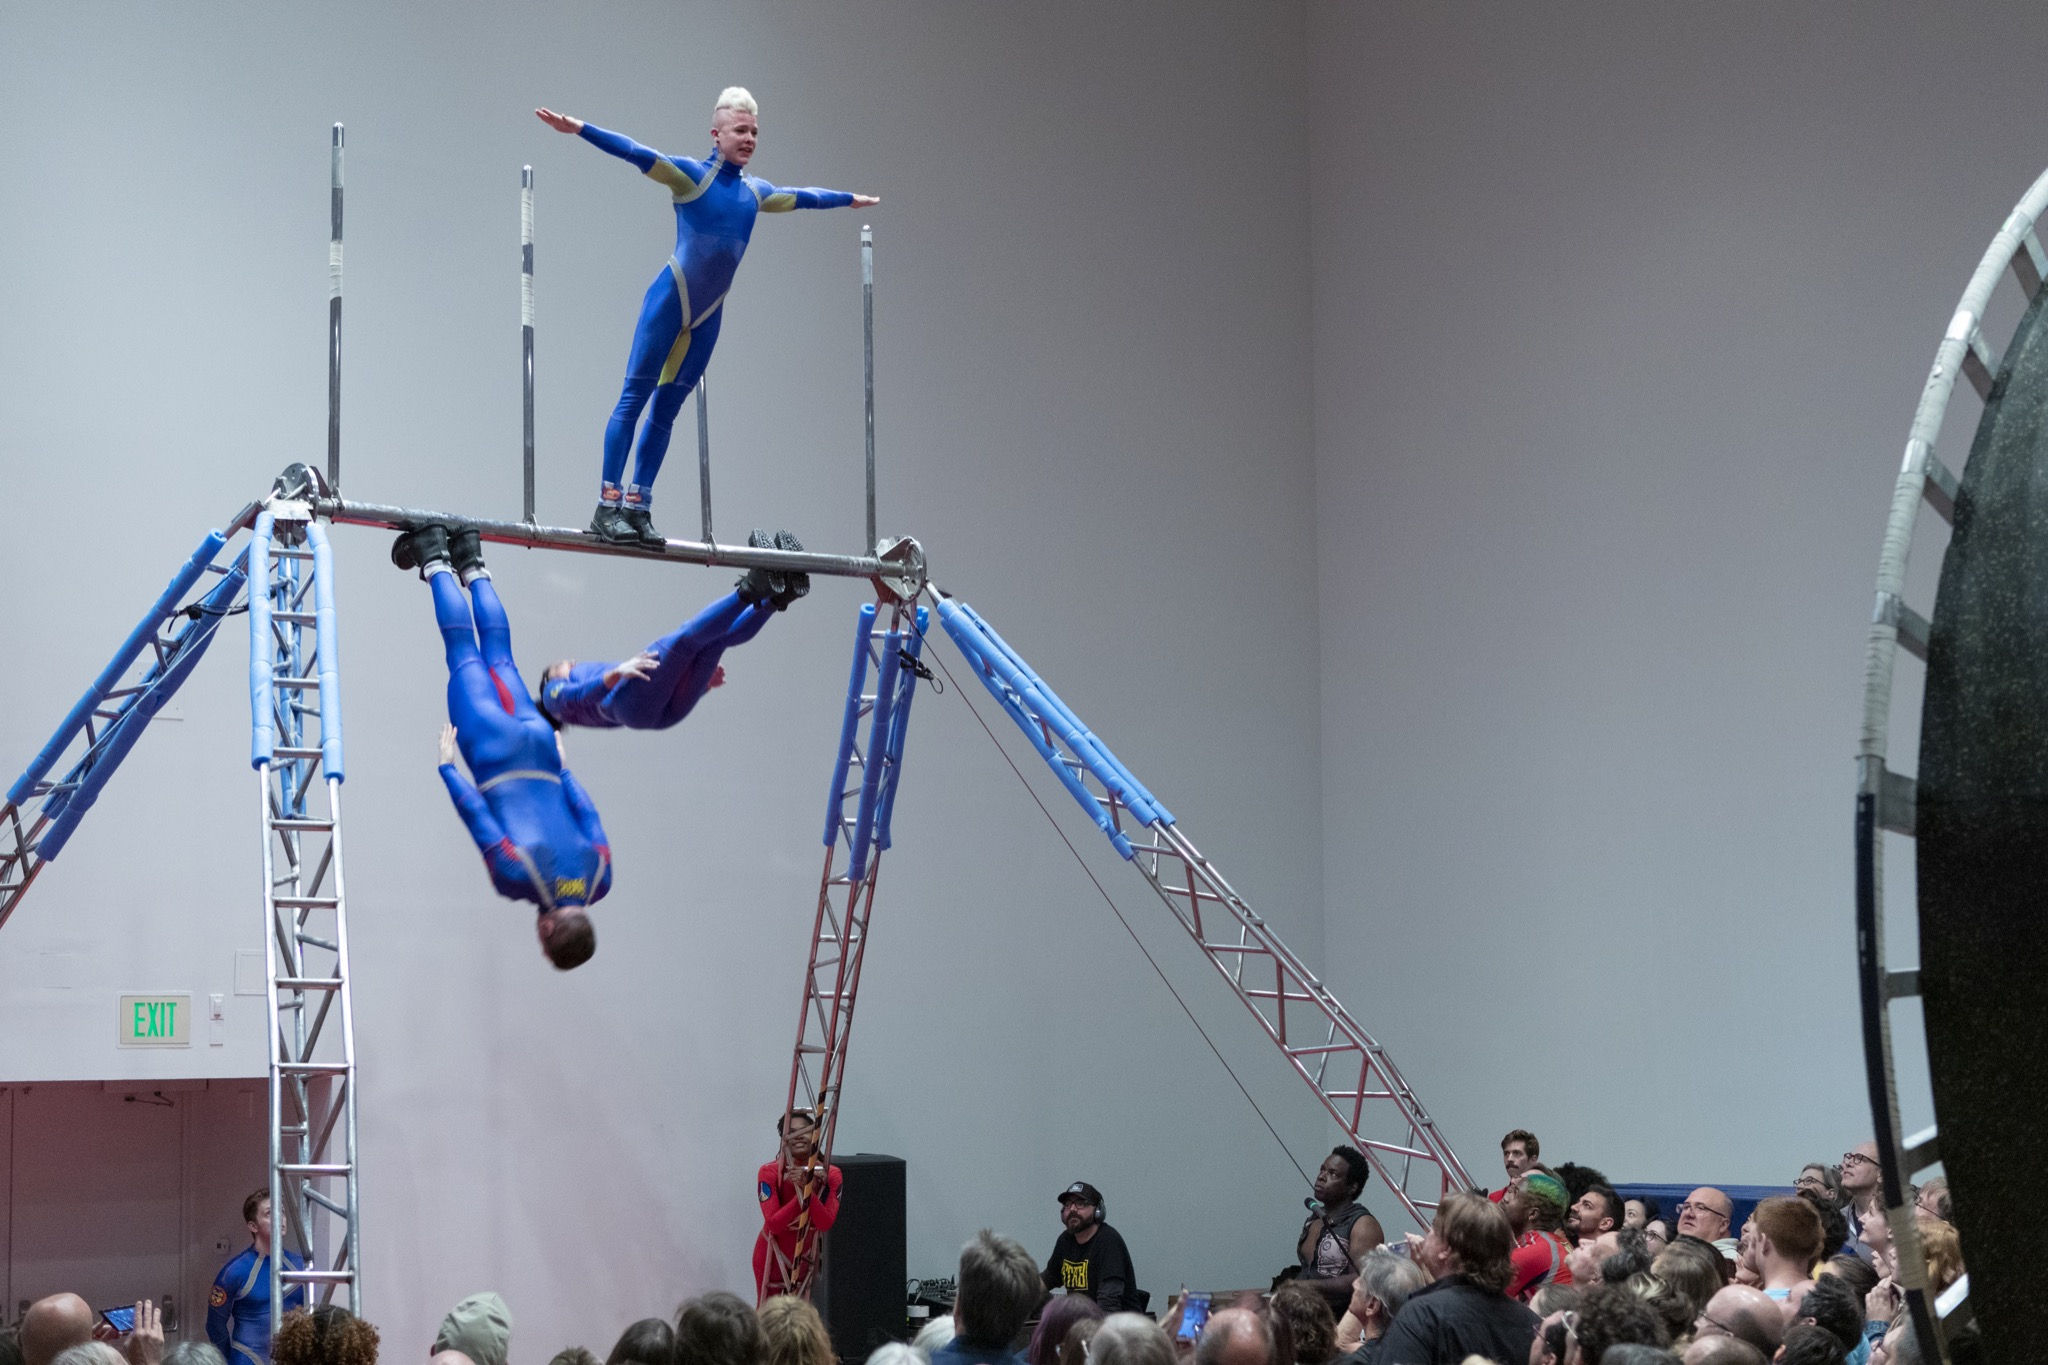 3 bodies rotate around a horizontal pole by their feet